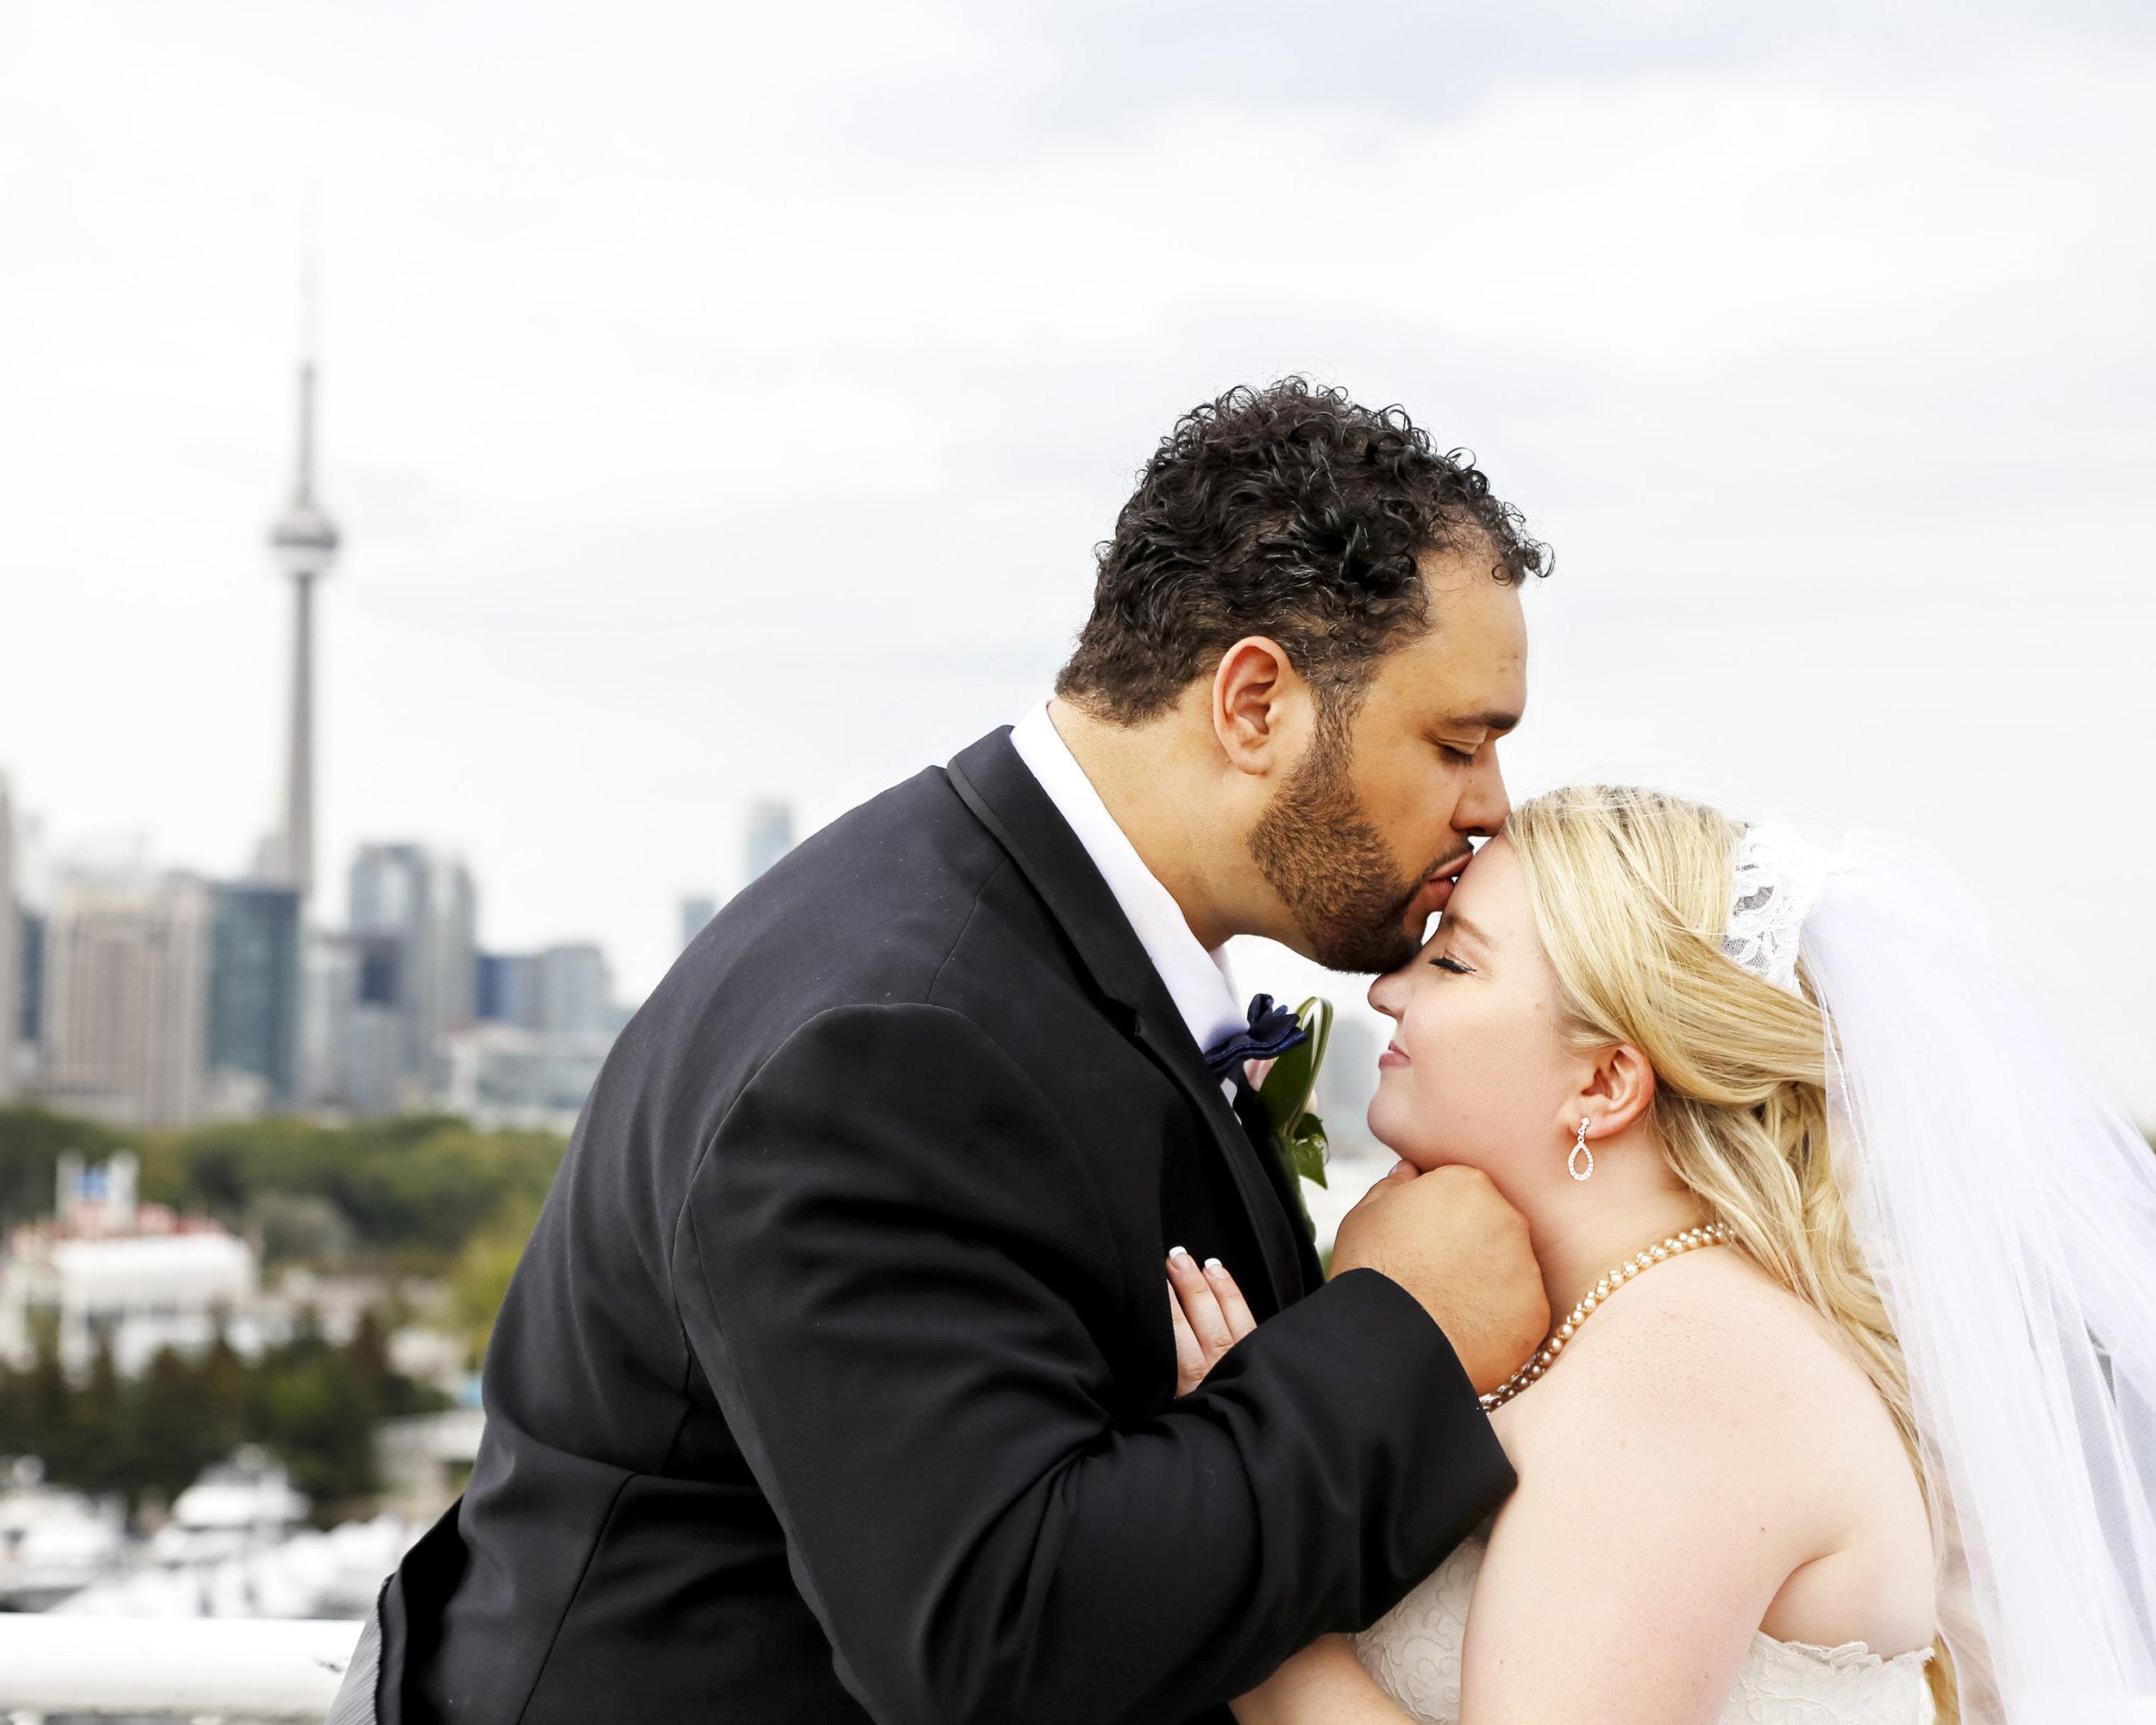 Juliano and Meagan-Wbsite-wedding.jpg